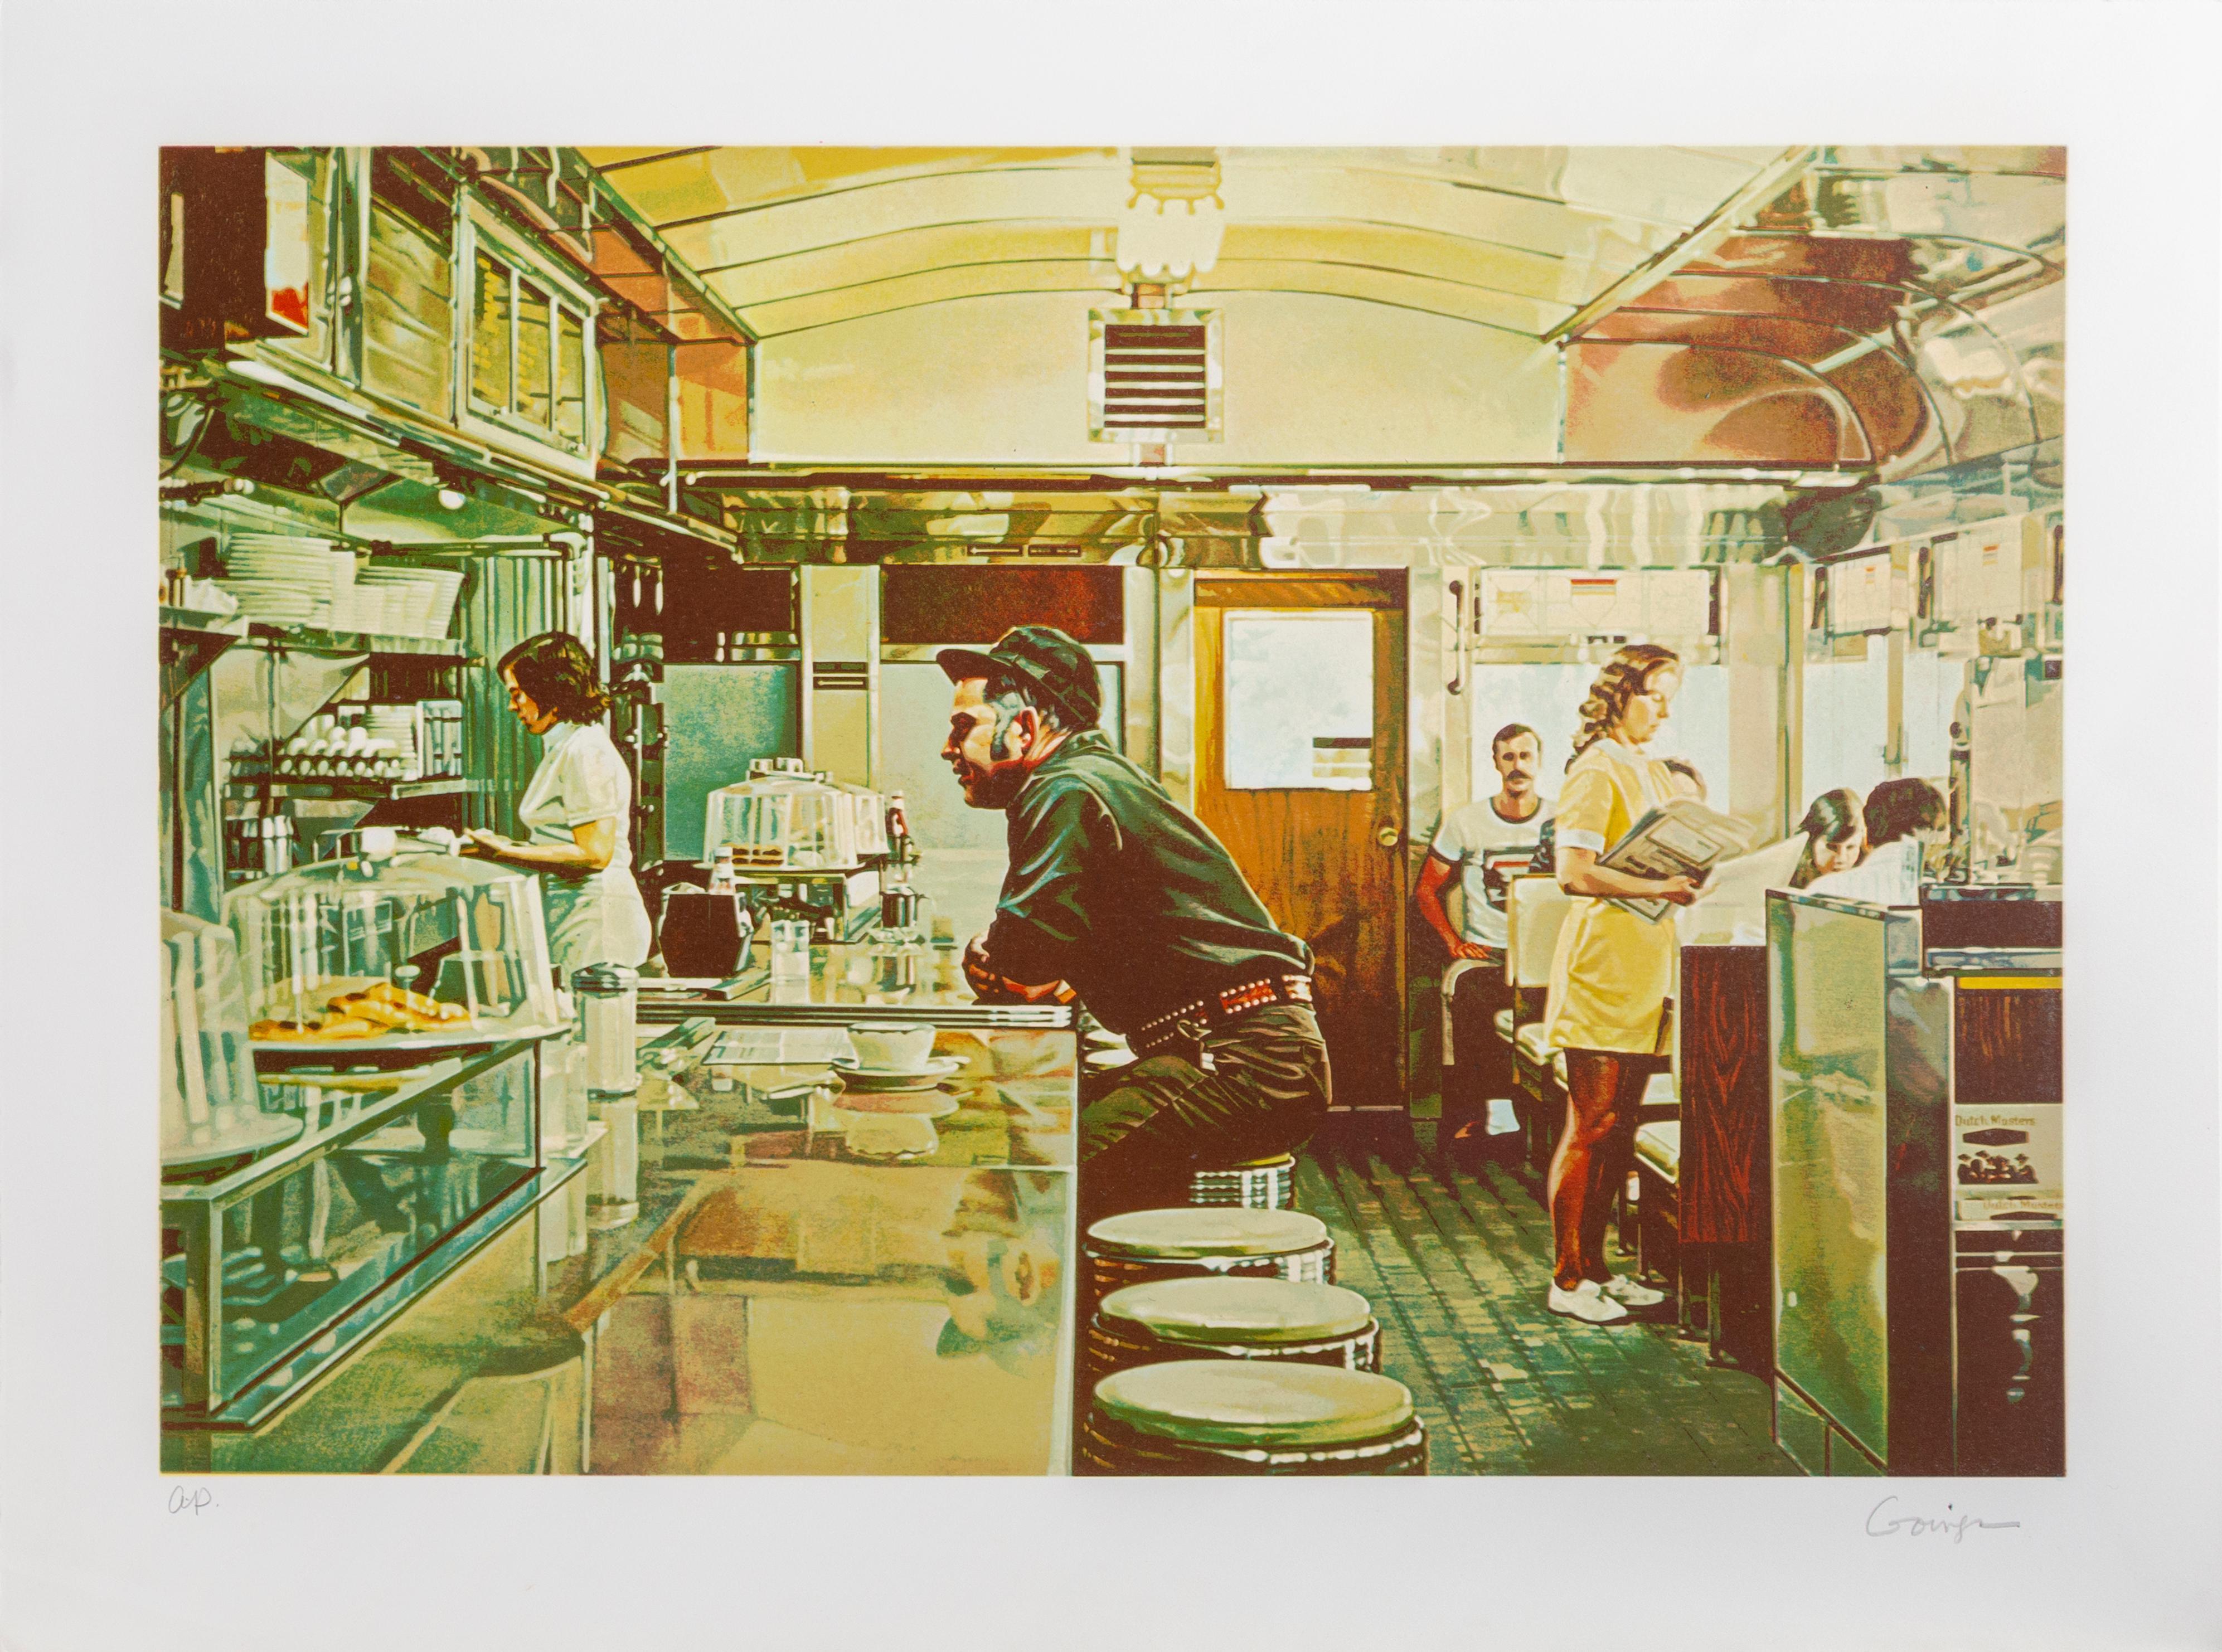 Unadilla Diner, Photorealist Silkscreen by Ralph Goings